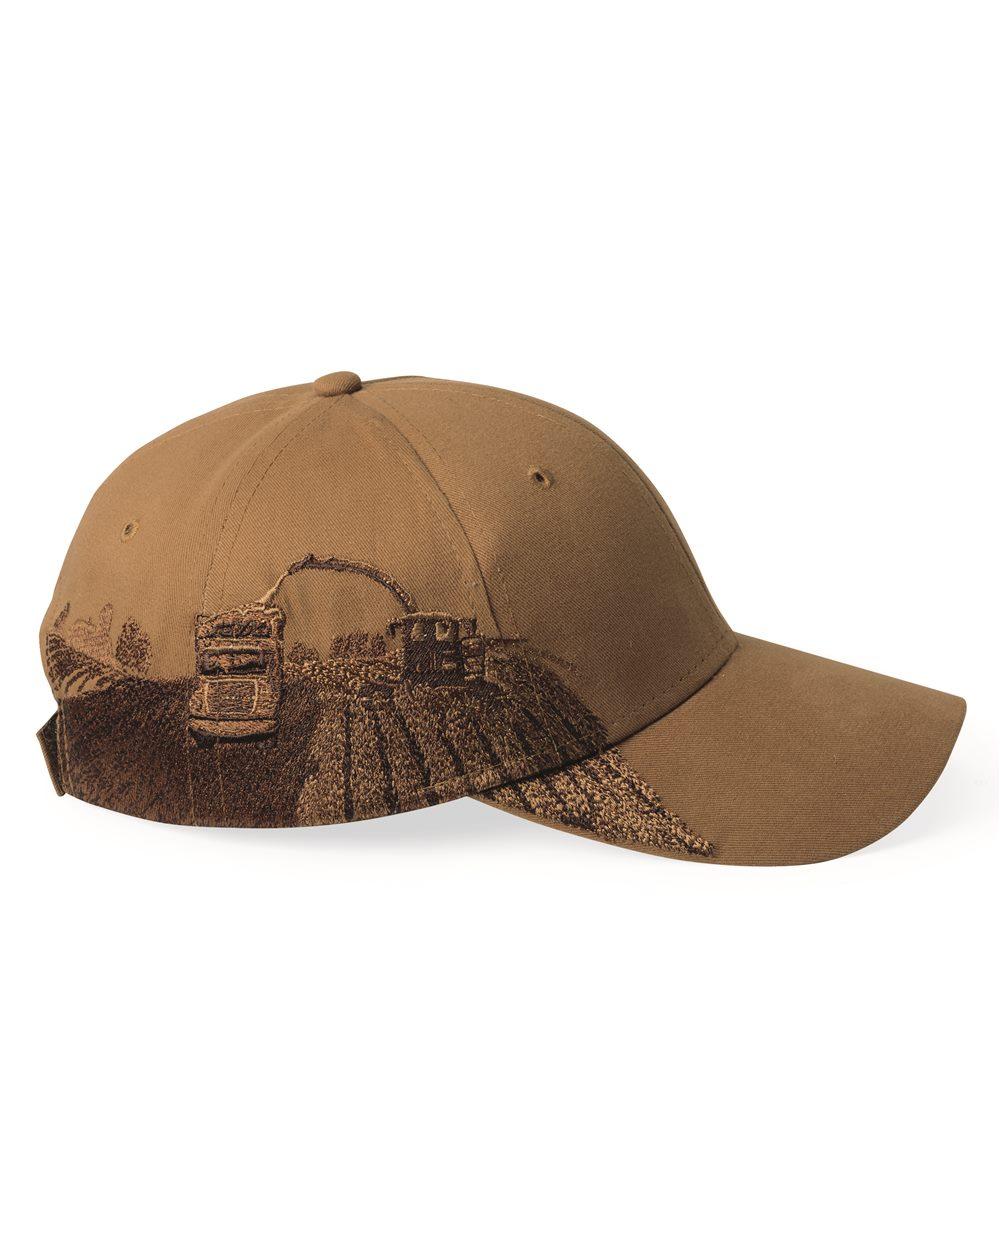 DRI DUCK 3351 - Harvesting Industry Cap